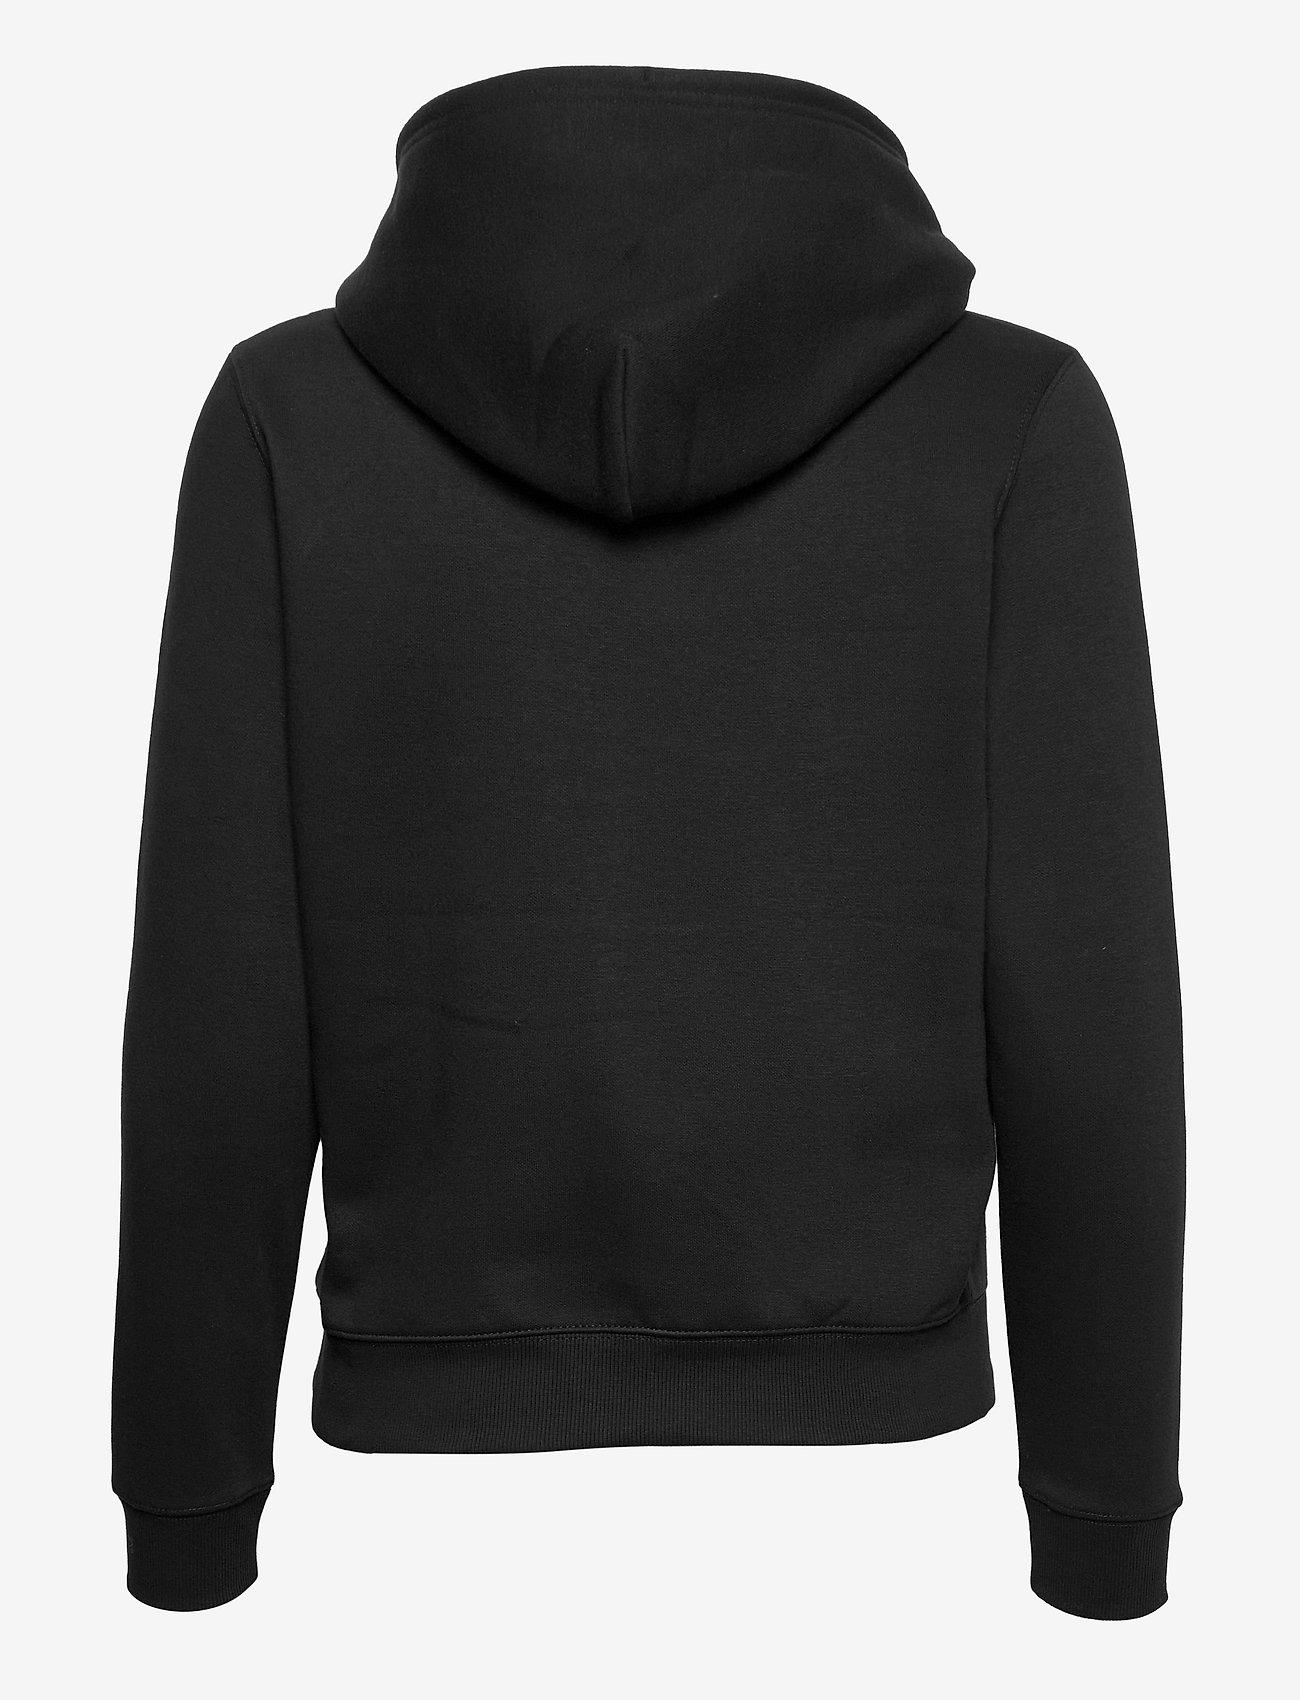 Tommy Jeans - TJW REGULAR FLEECE HOODIE - sweatshirts & hoodies - black - 1